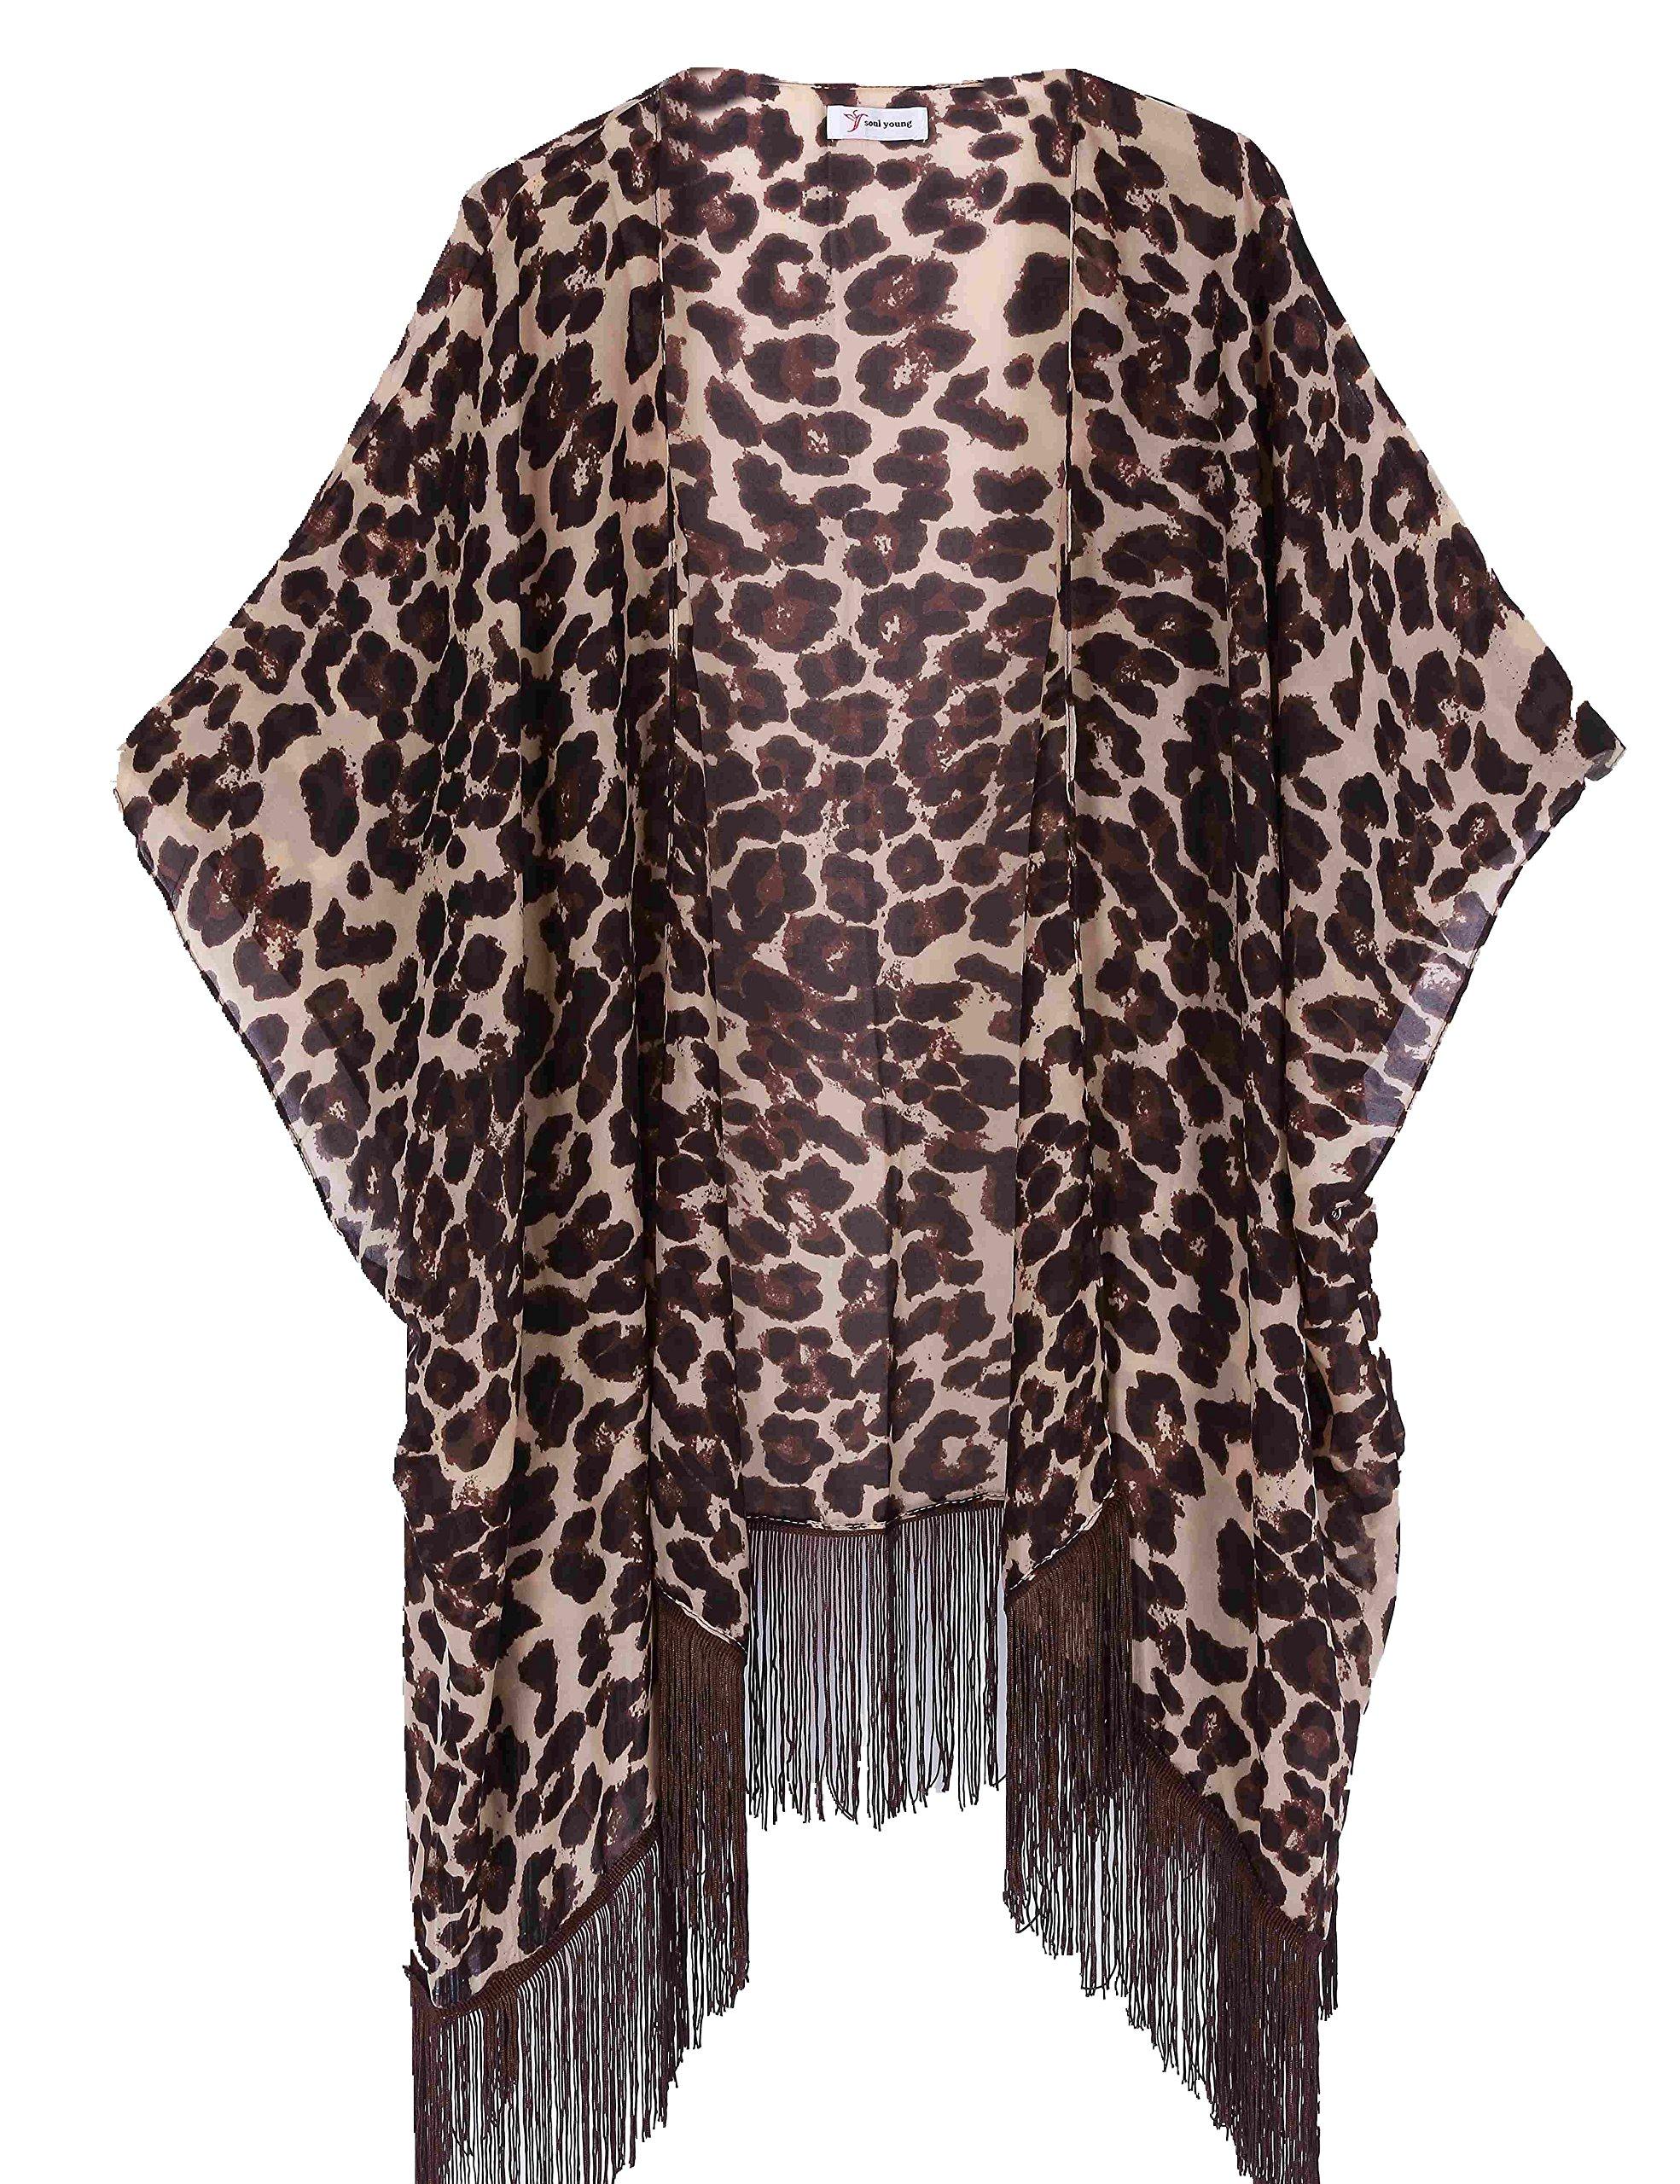 Women's Floral Kimono Cover Up - Lightweight Leopard Chiffon Beachwear for Bikini,Cardigan and Swimwear(One Size,Leopard)